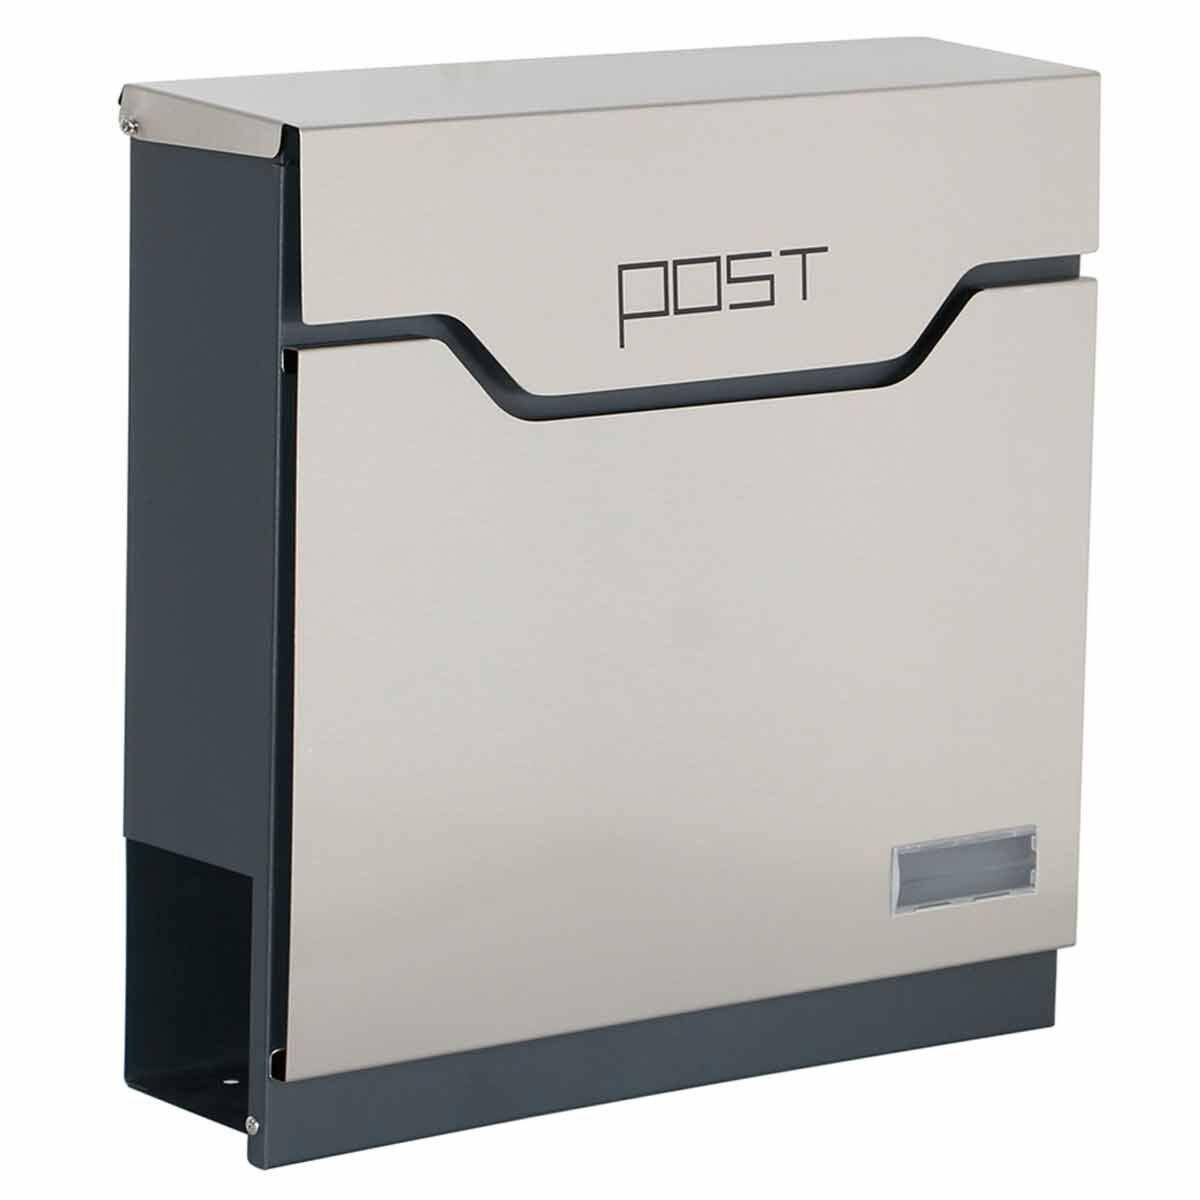 Phoenix Estilo MB0123KS Top Loading Letter Box with Key Lock